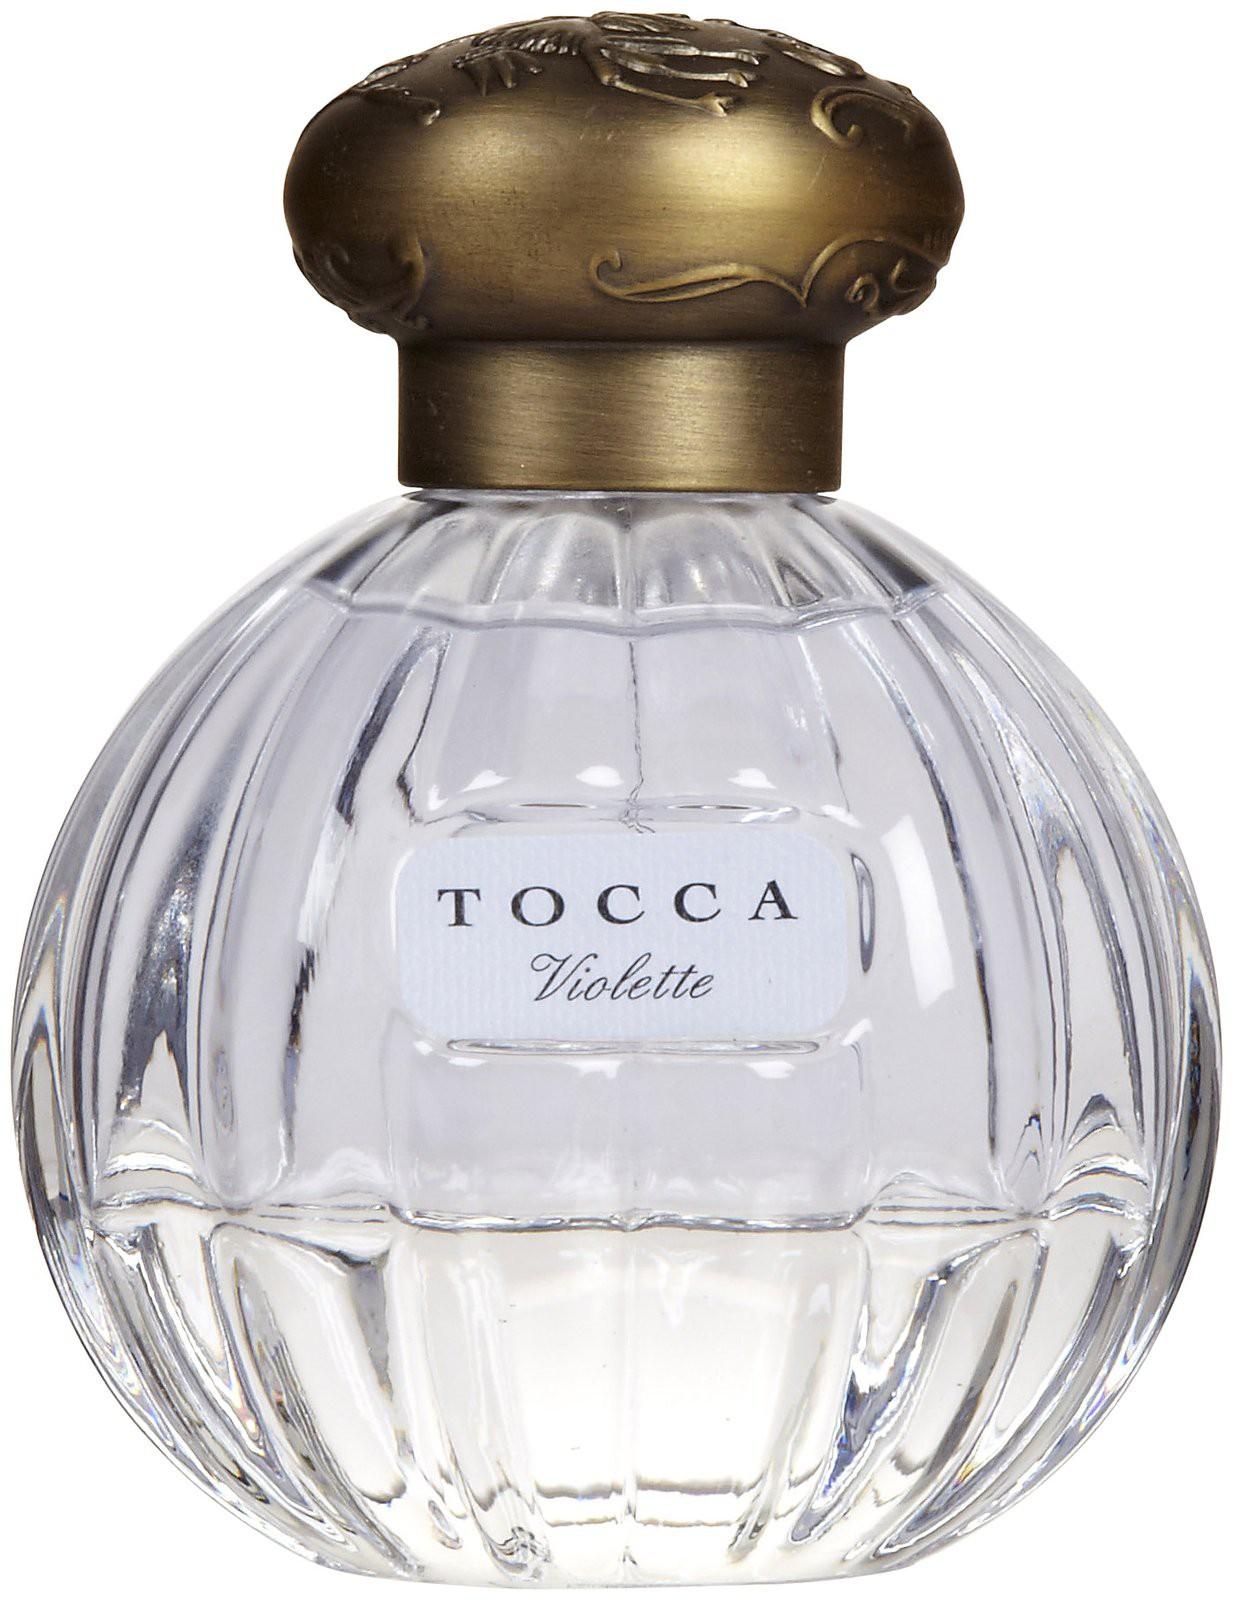 Tocca Violette аромат для женщин